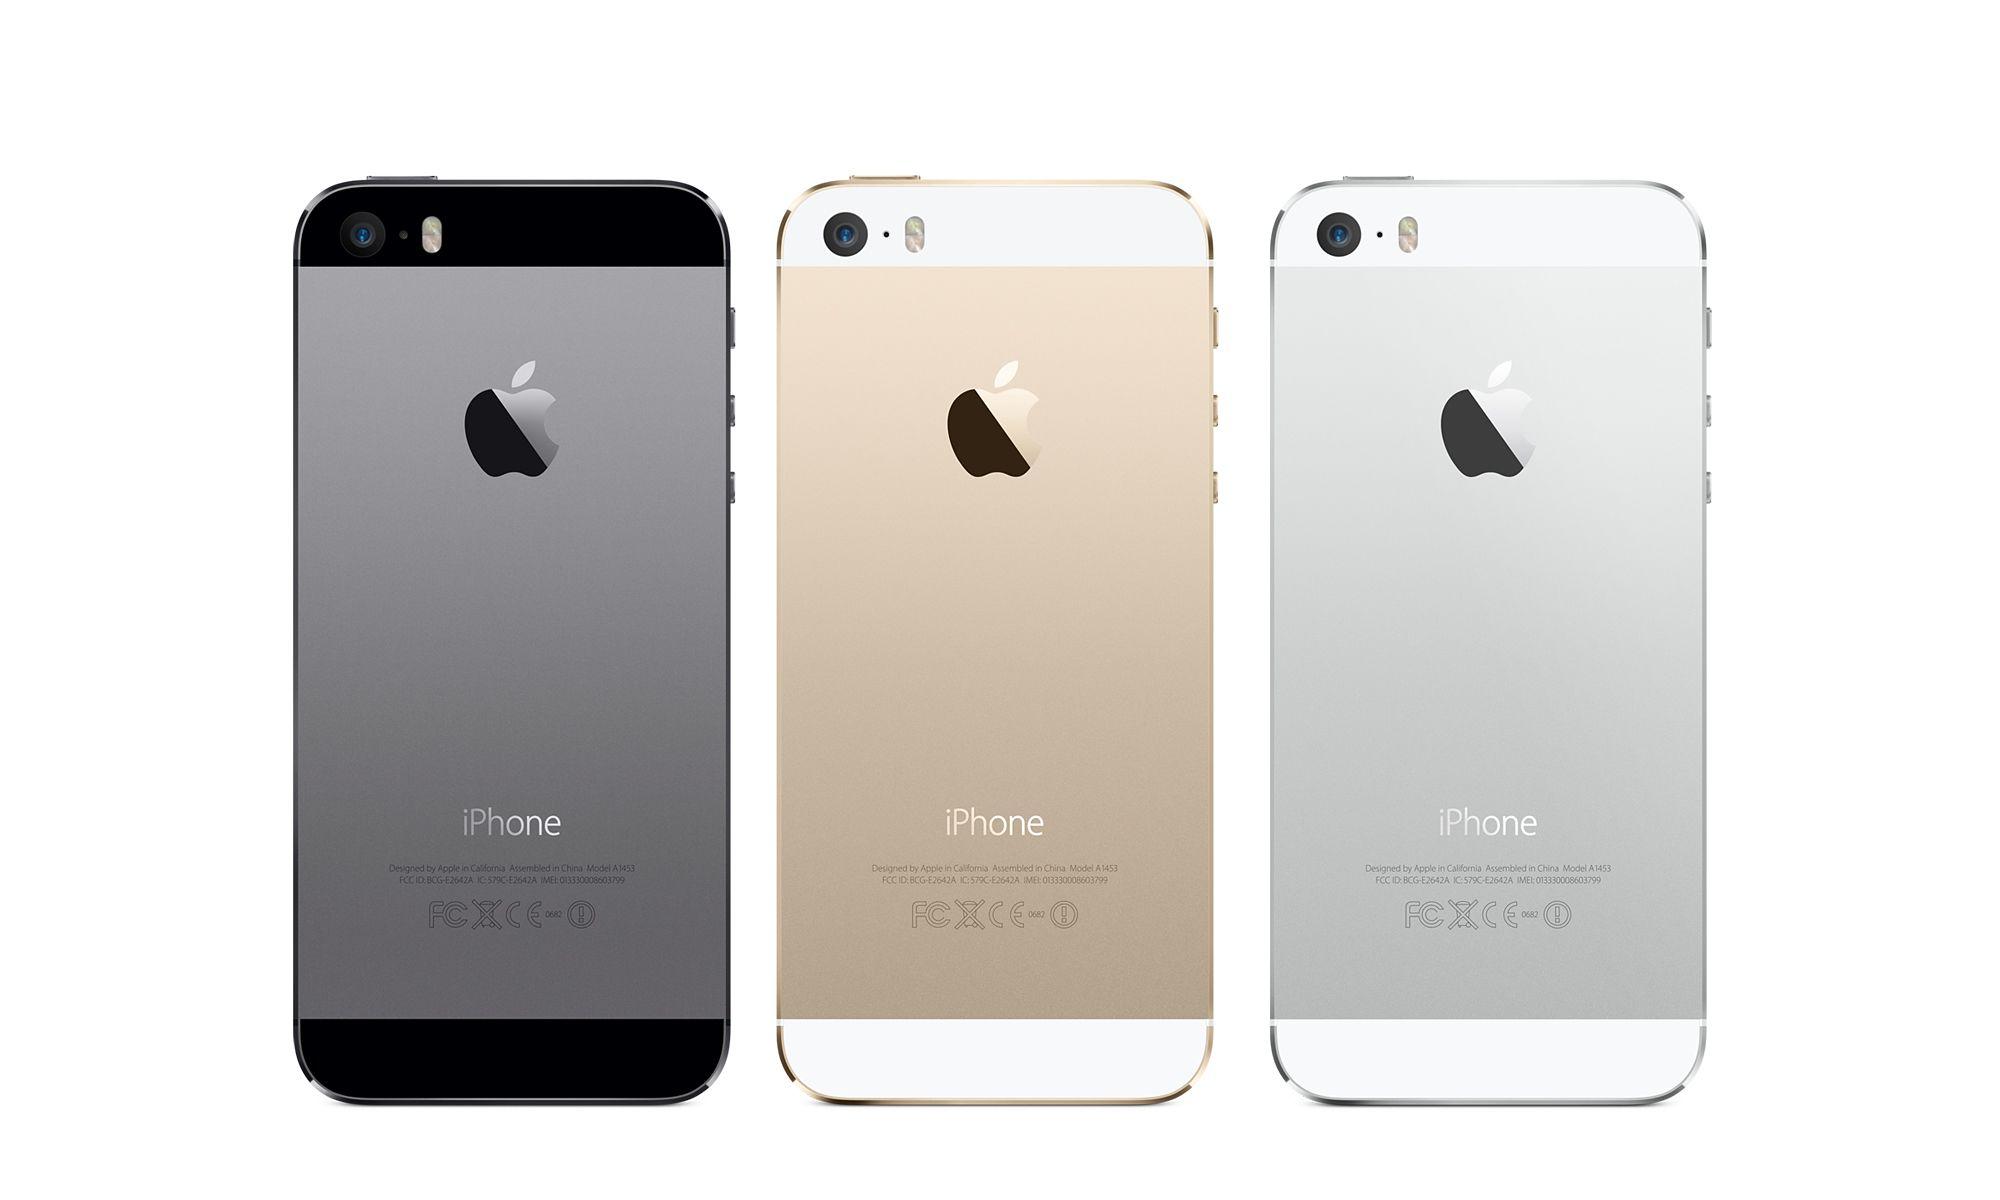 iPhone 5sと5cが2週連続でトップ10独占、Nexus 5は初登場20位にー携帯電話販売ランキング